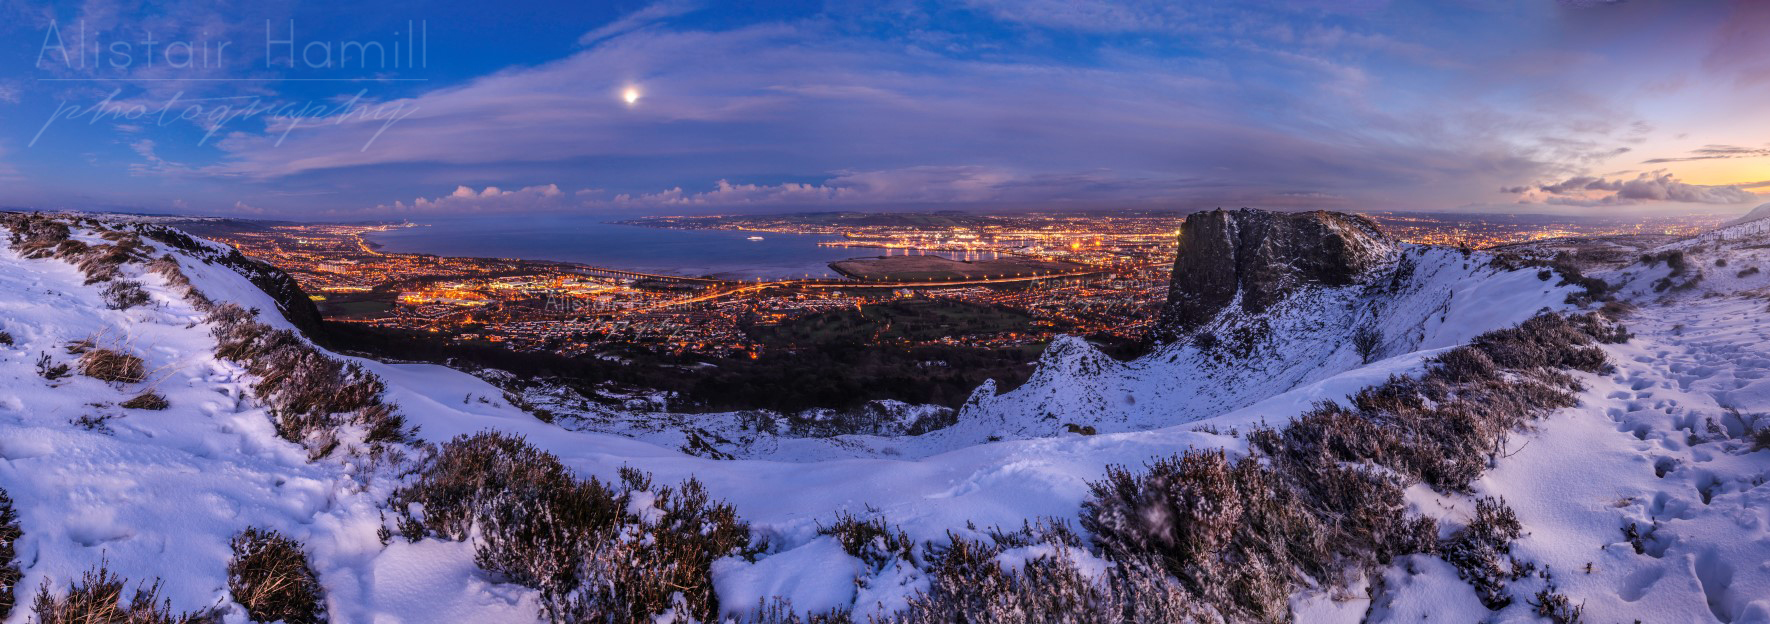 Cavehill snow twiight pano (Large) wm.jpg